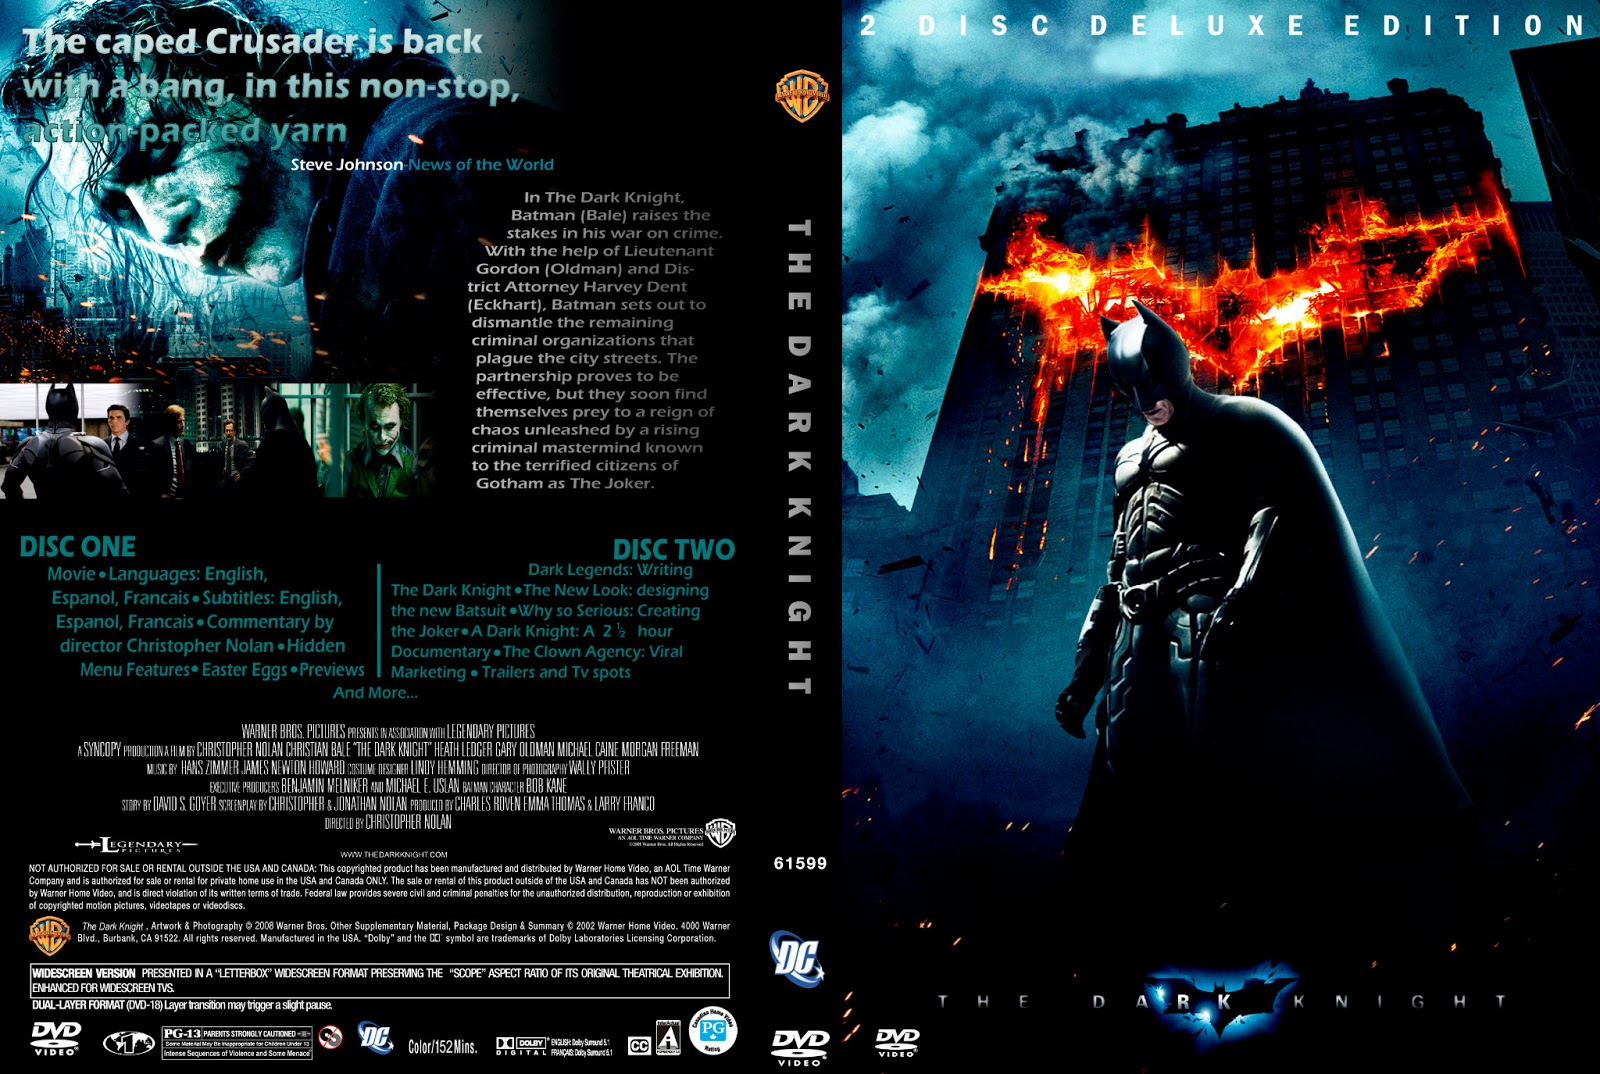 RevolveRelease - Movie & Anime Share